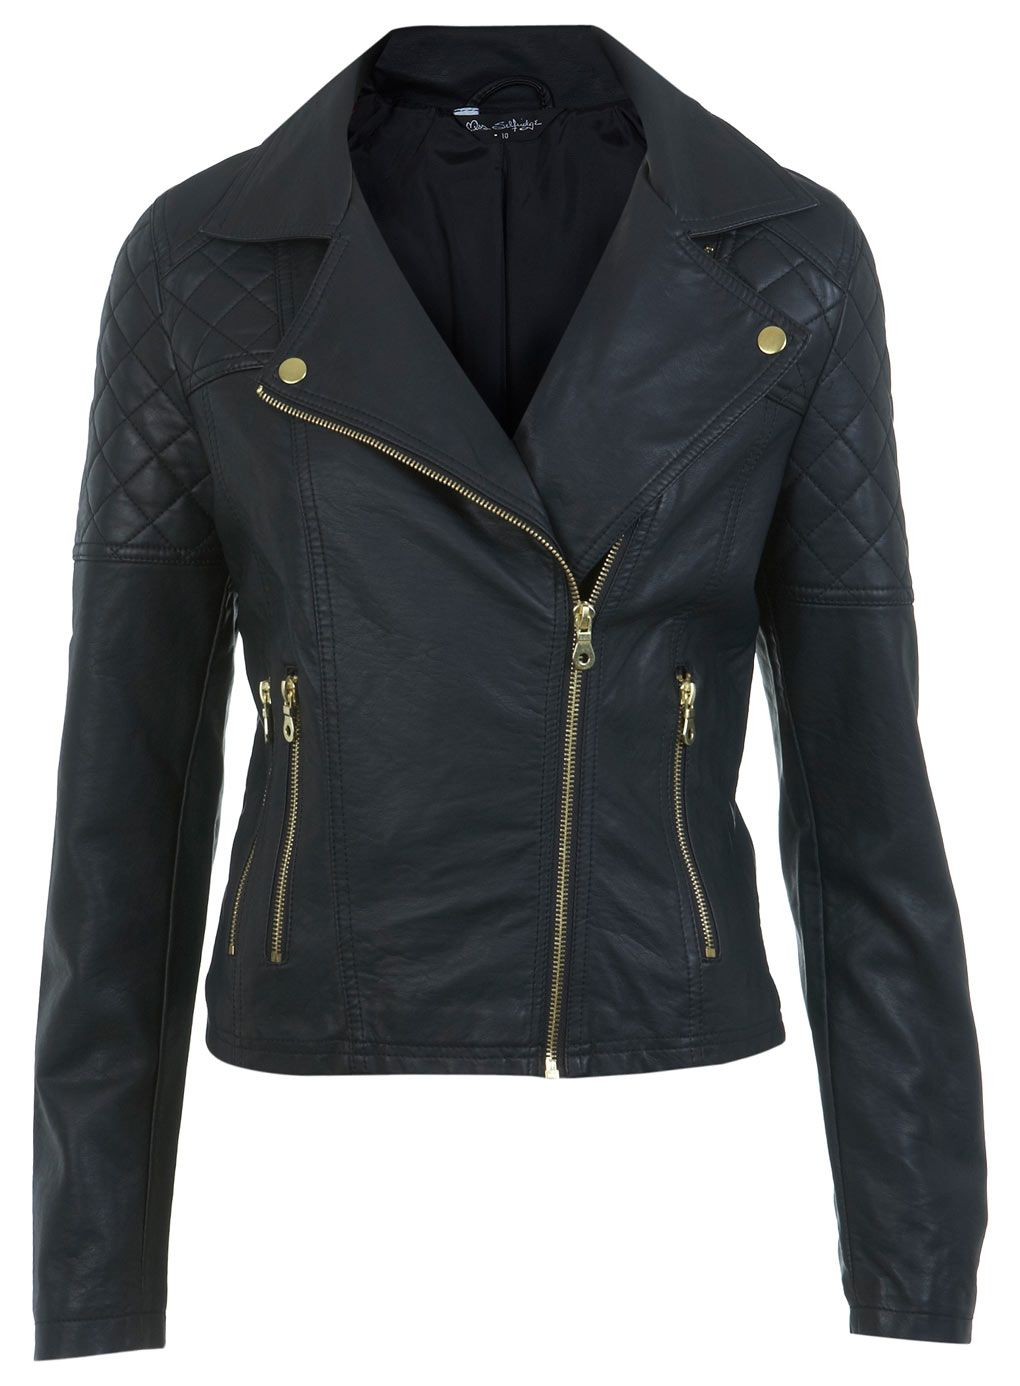 47221f63b Gold Trim Faux Leather Biker - Coats & Jackets - Clothing - Miss ...